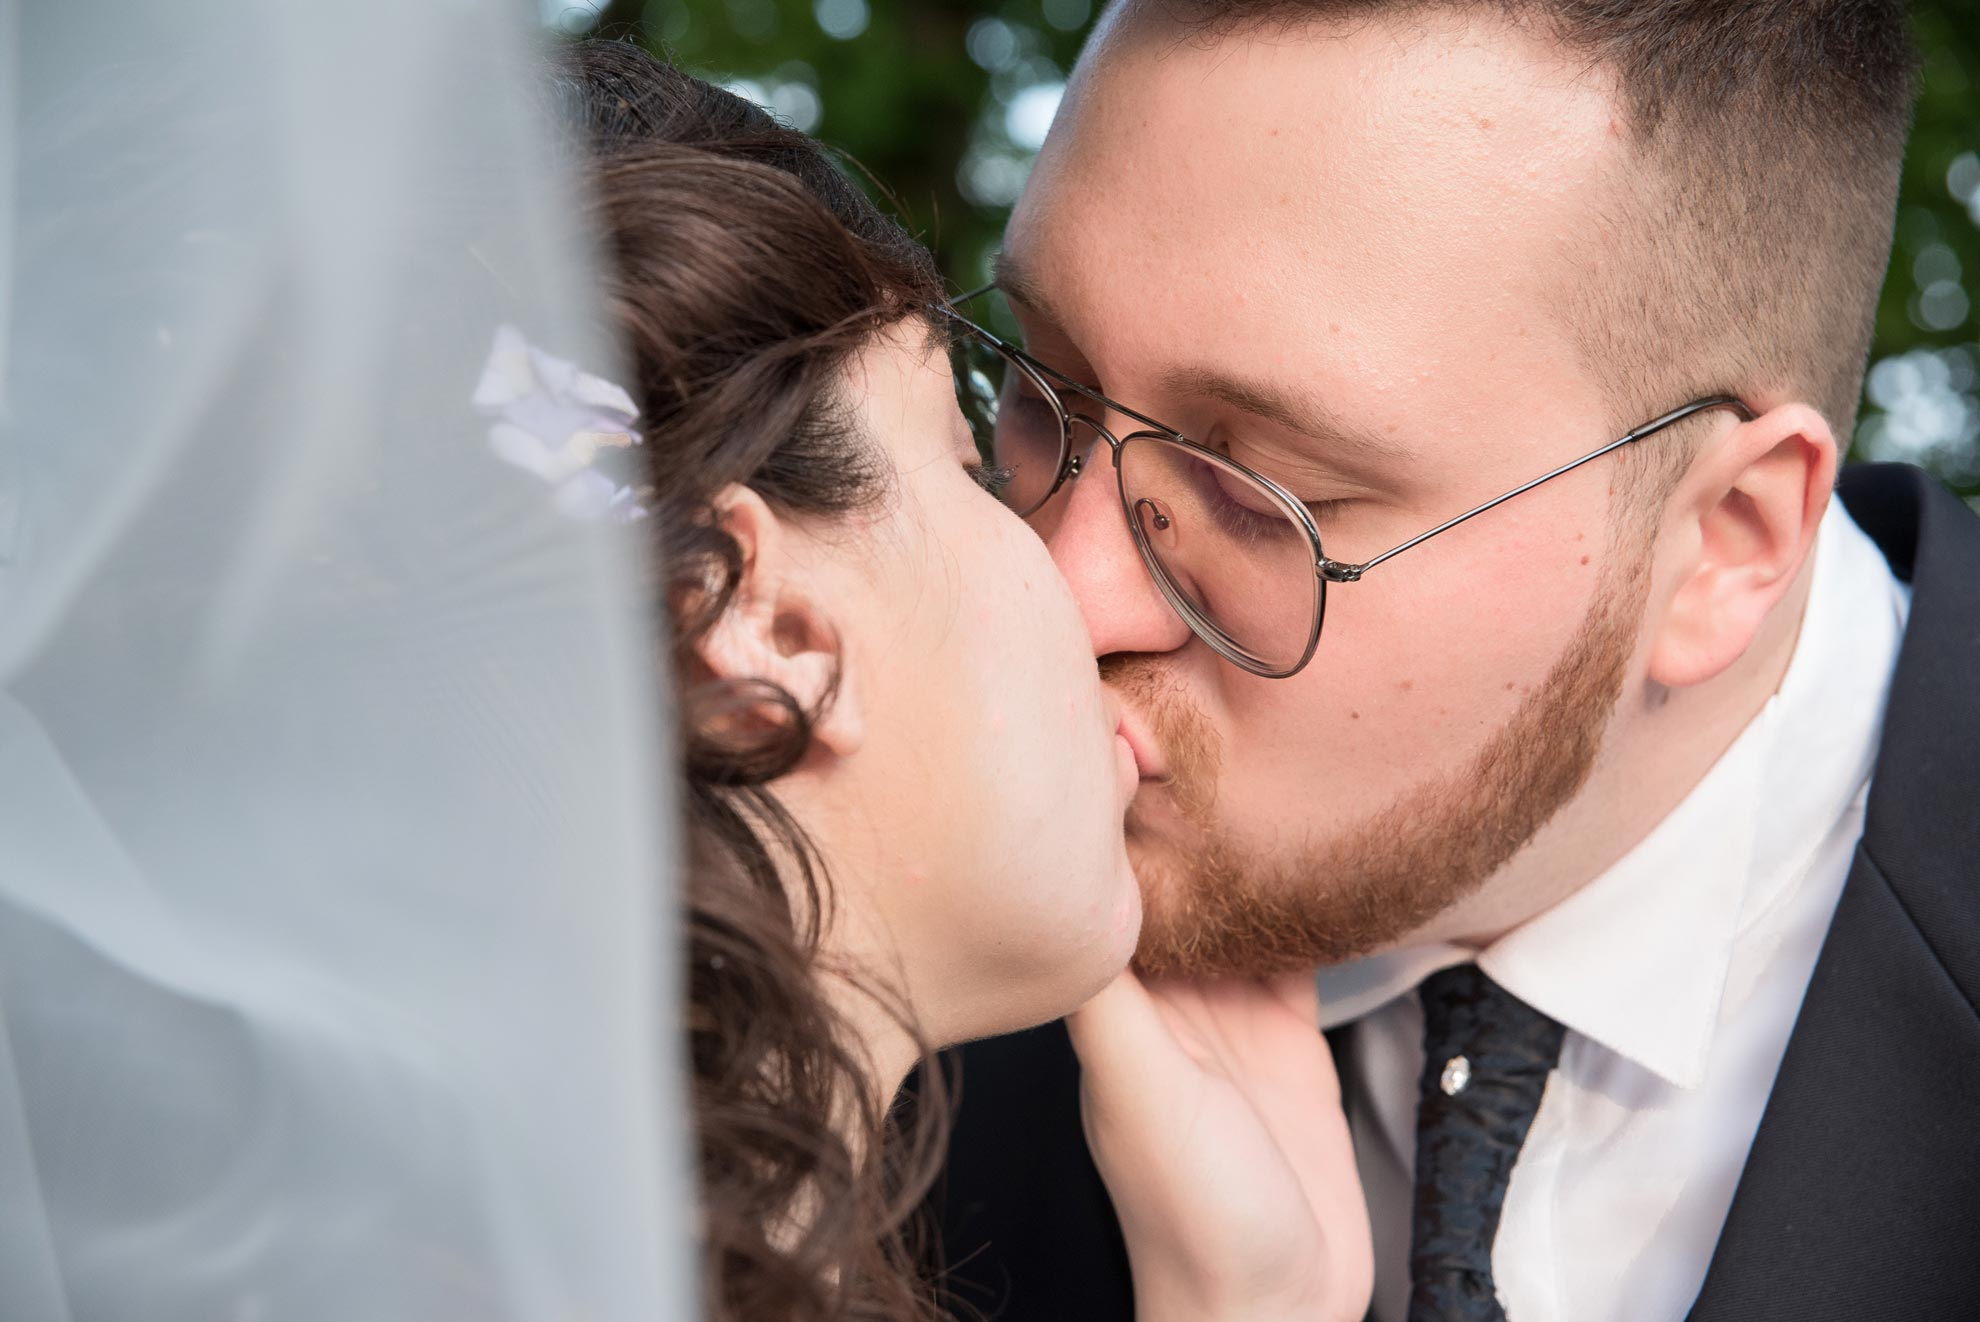 Matrimonio a Narzole Lorenza Diego - DSC 3327 - Fotografo matrimonio Torino - Fotografo matrimonio Torino